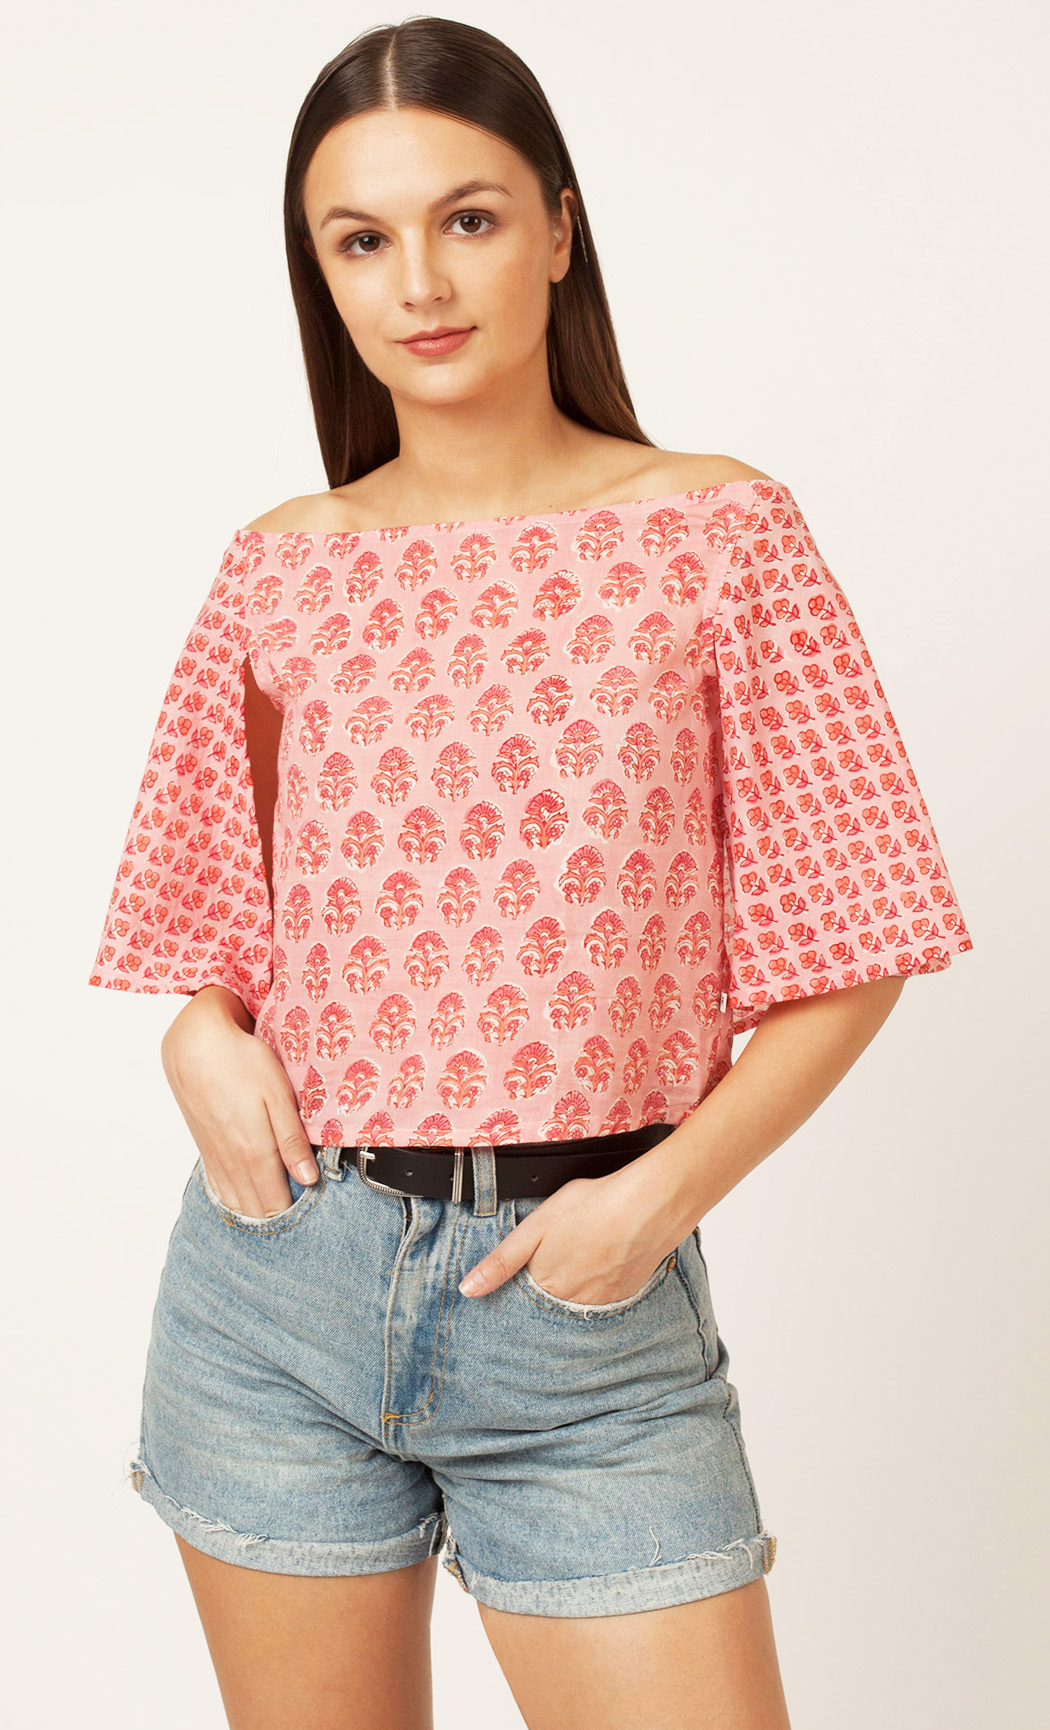 Pink Printed Off Shoulder Top. Buy Online